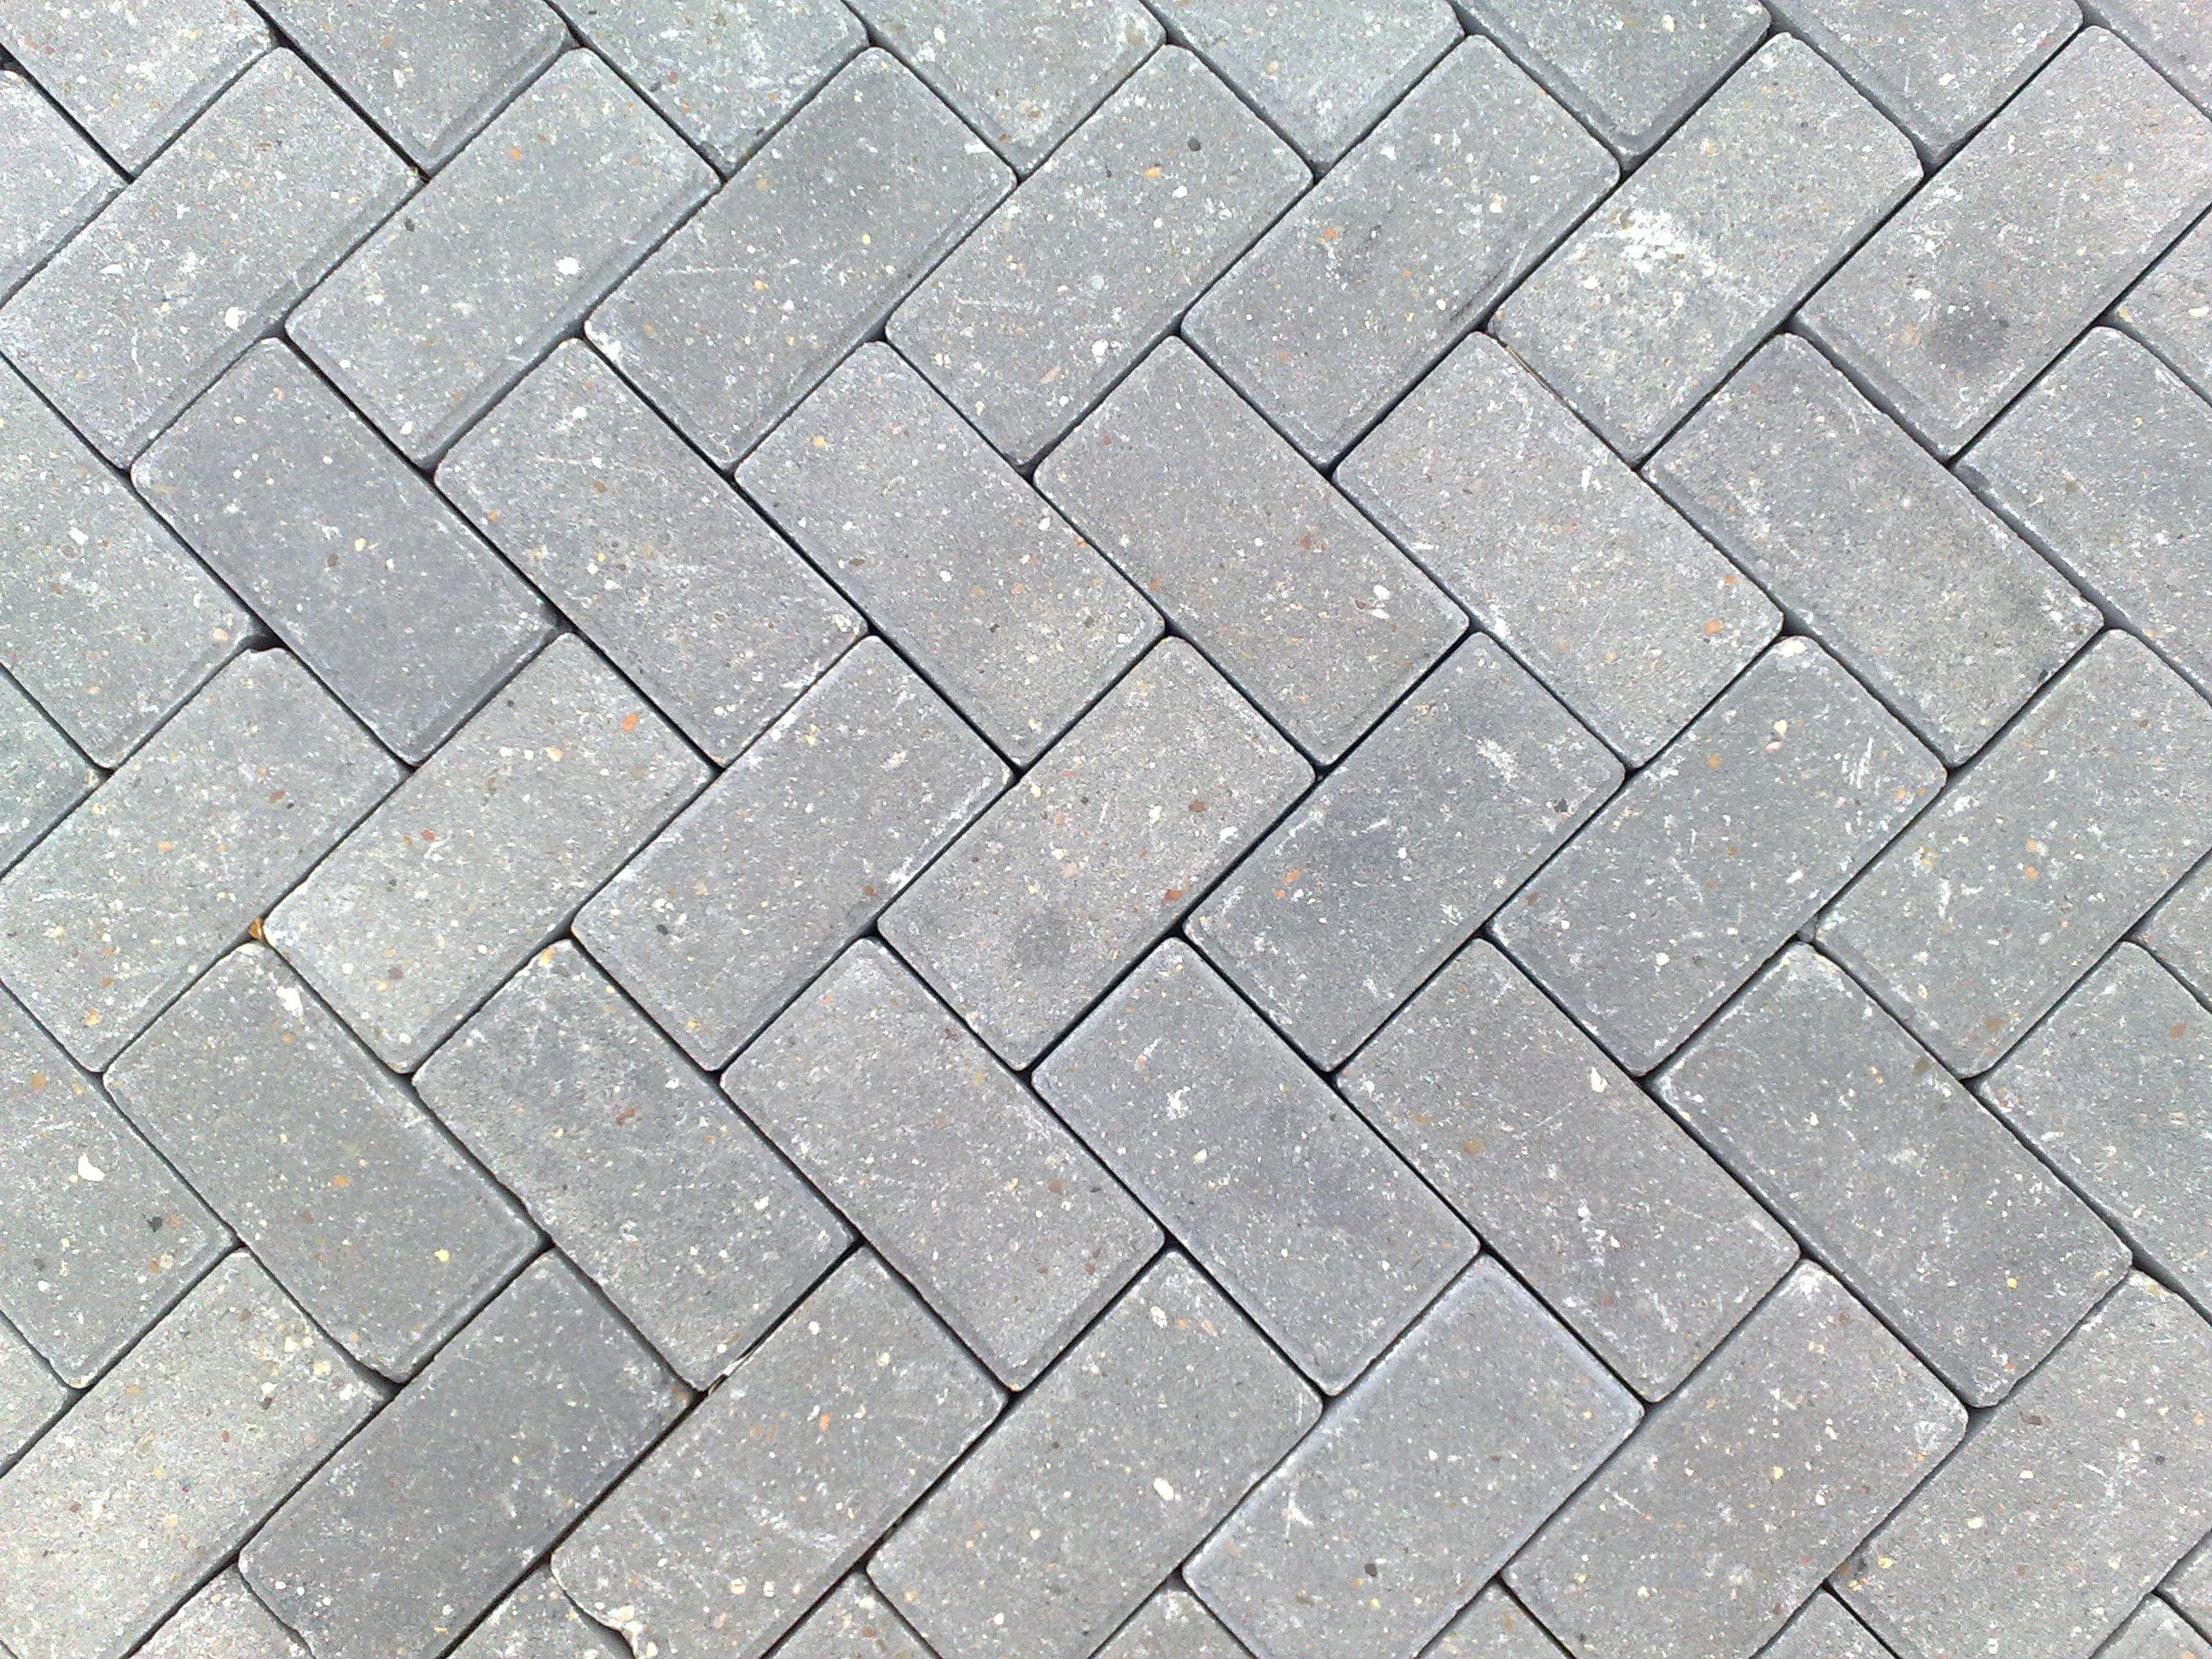 [Resim: textures_v1_32f8sz0.jpg]